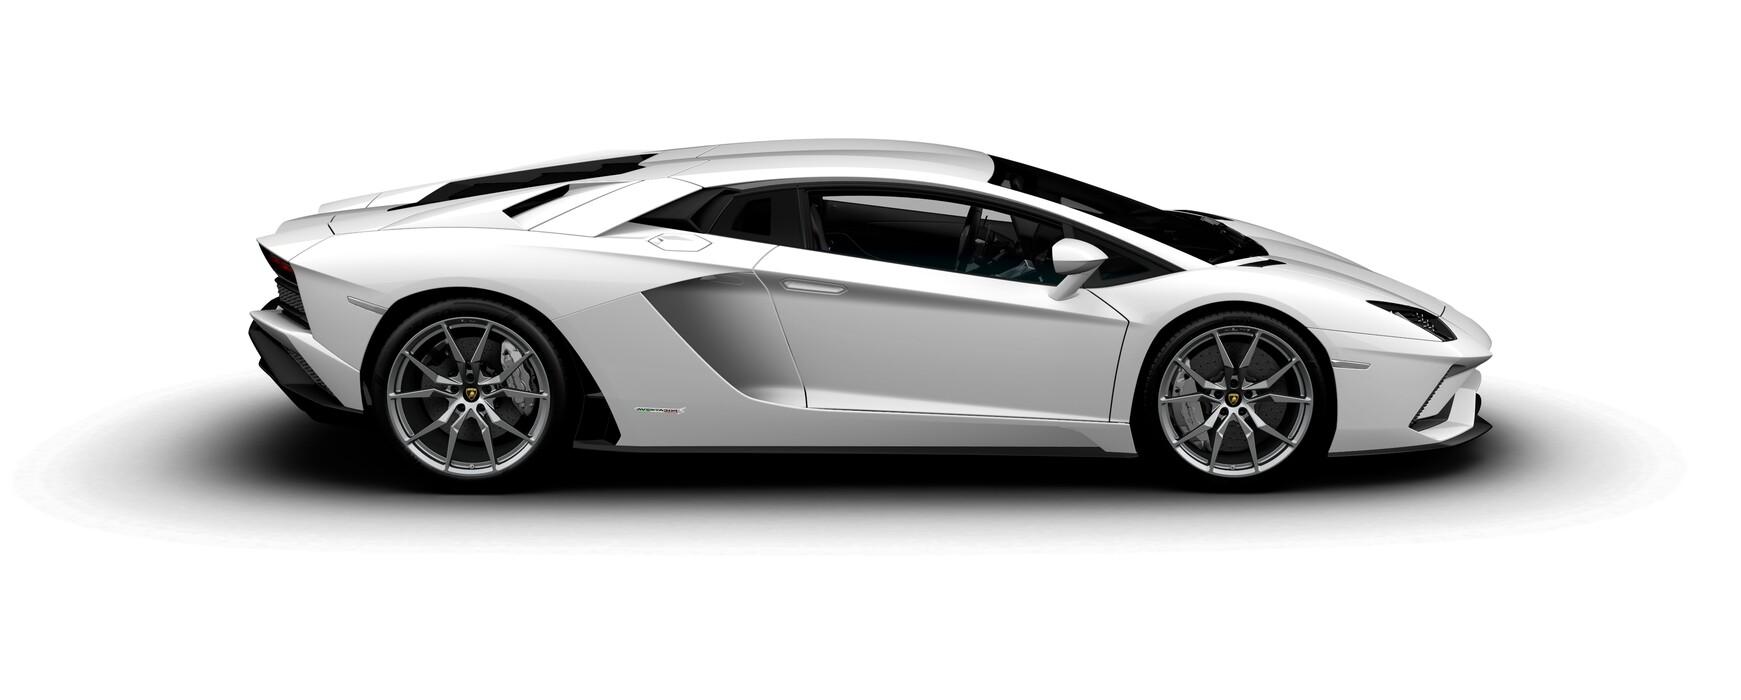 Lamborghini Aventador S Coupe gloss Bianco Isi side view